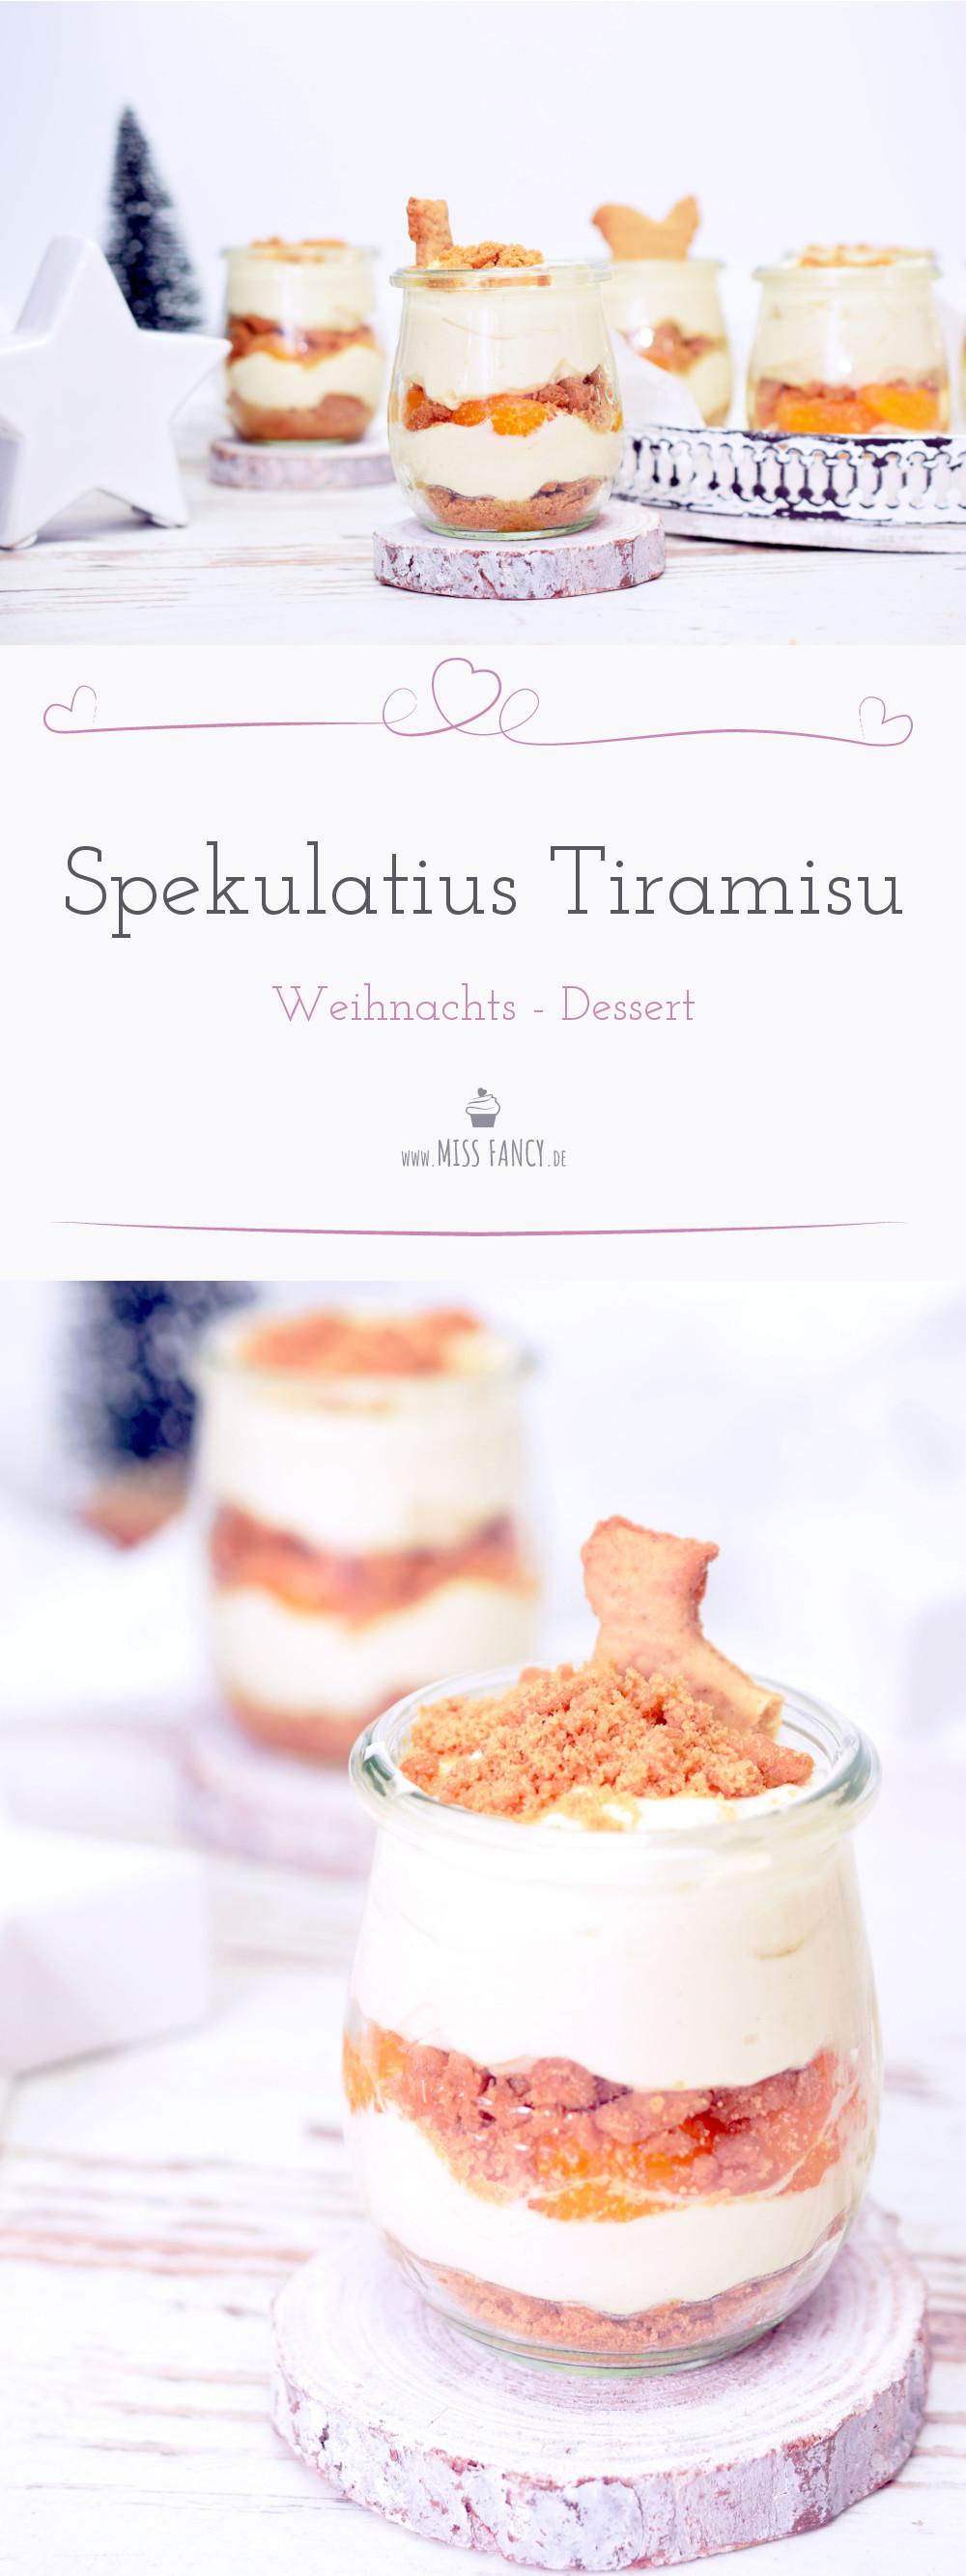 Rezept leckeres Spekulatius Tiramisu